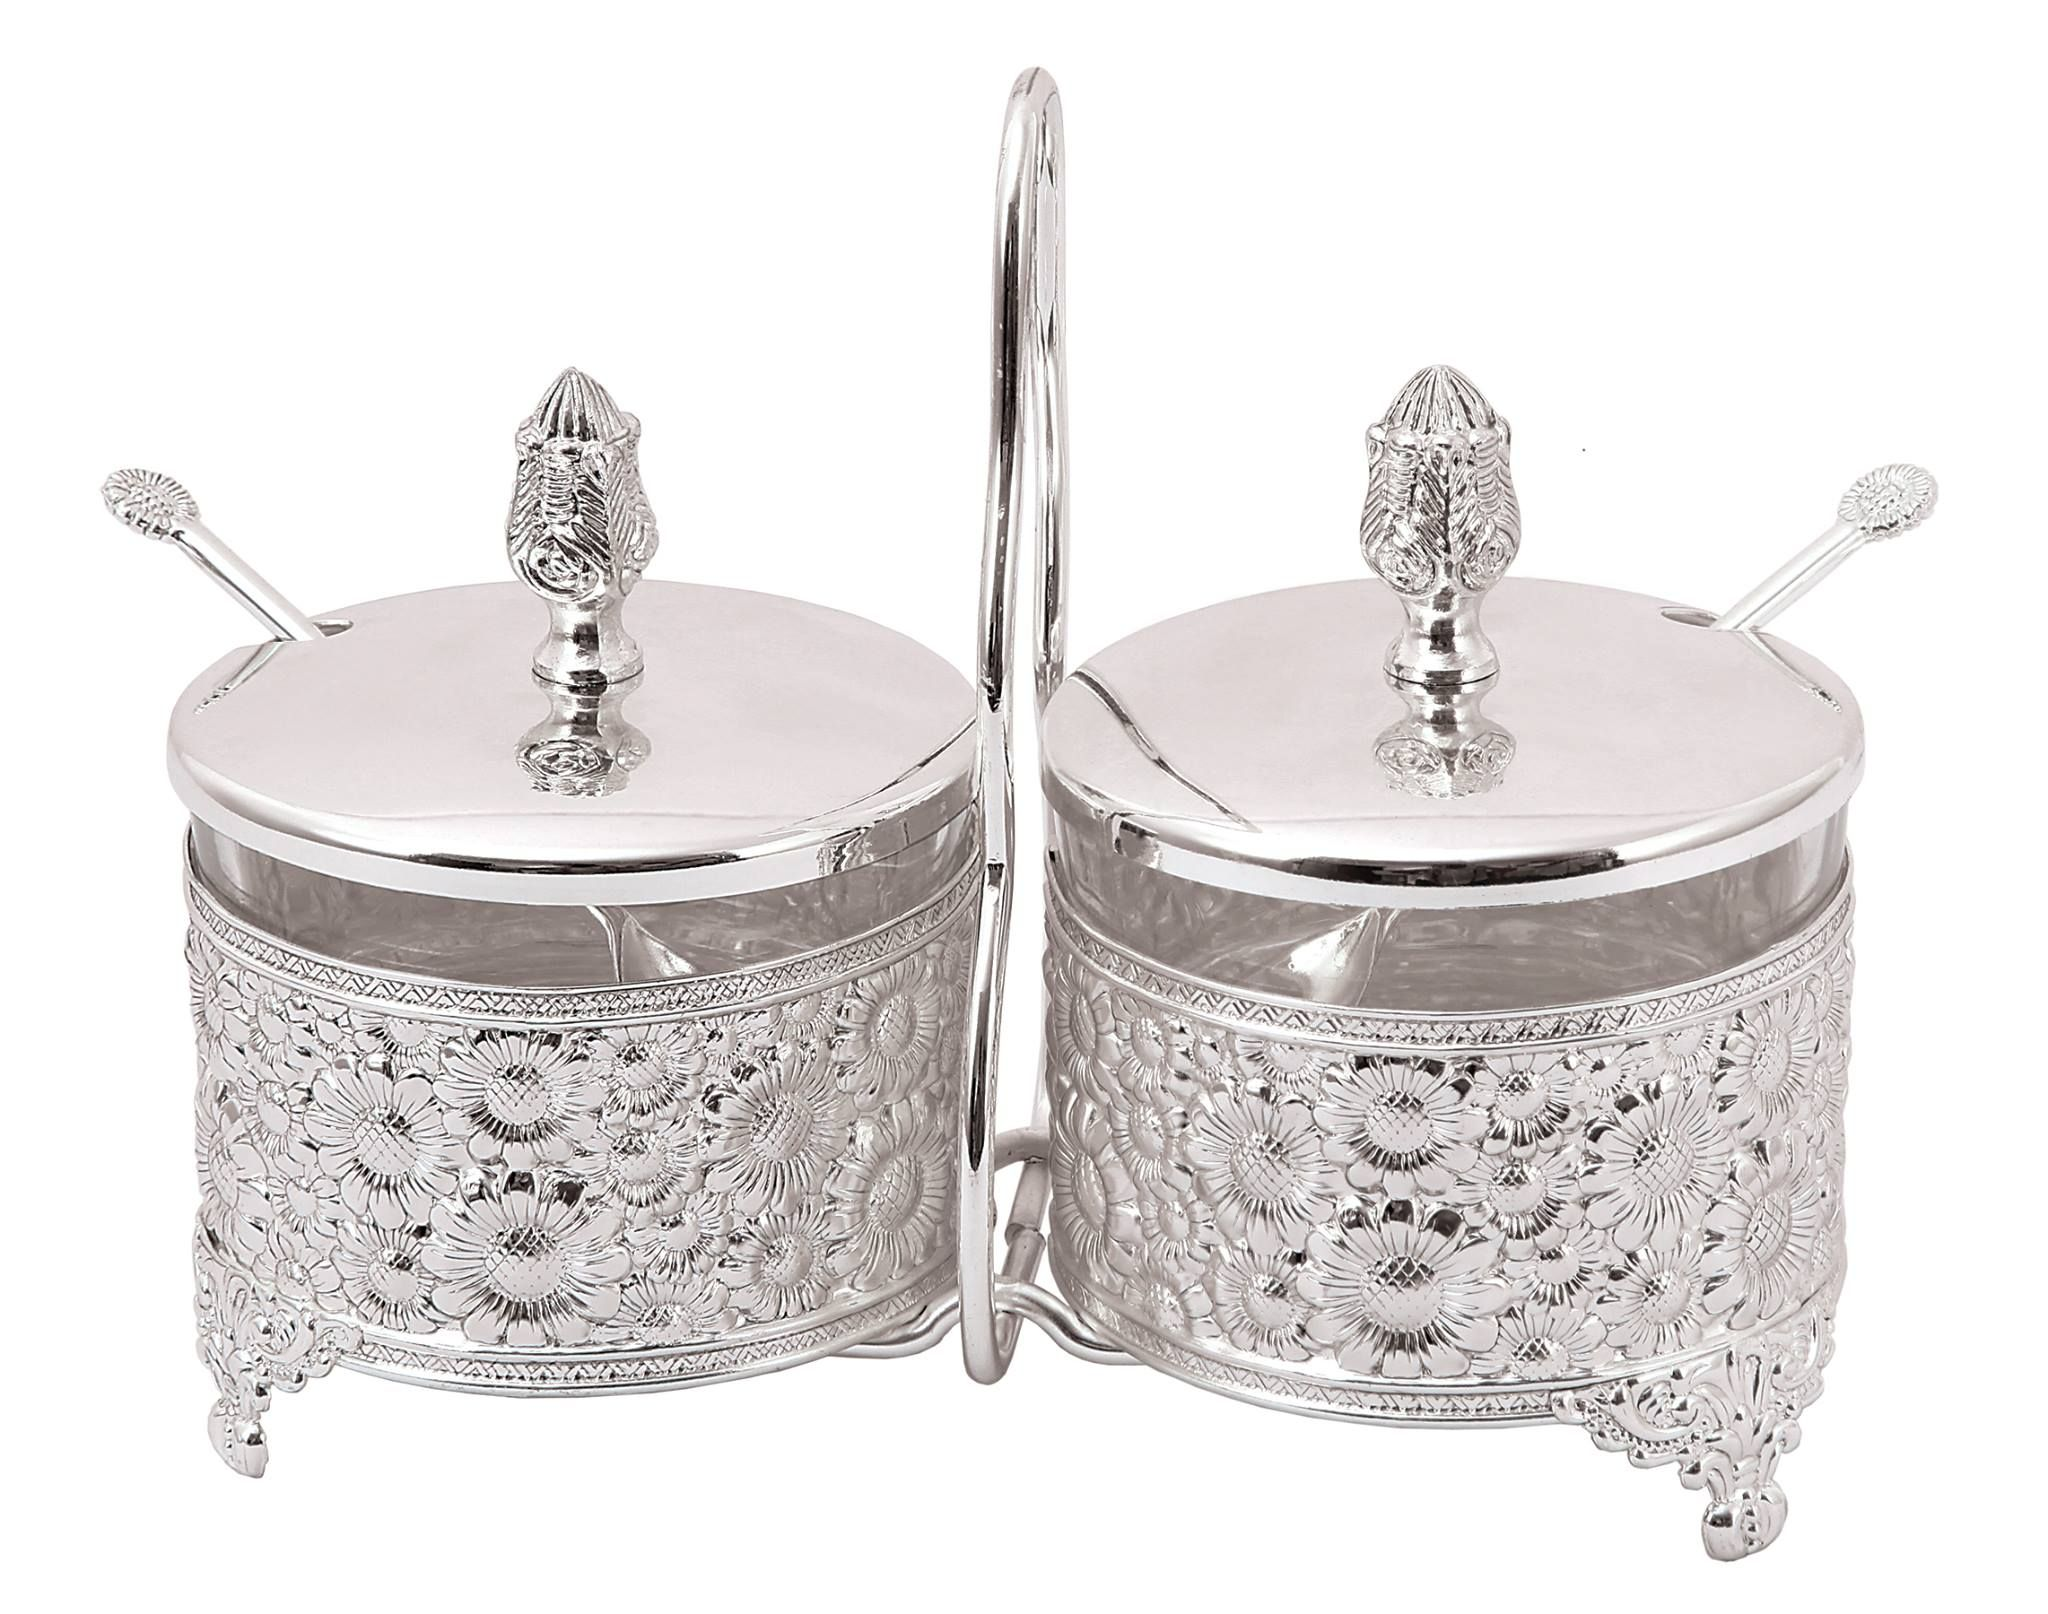 Classy Italian Silver Plated 2 Bowl Pickle Set - collections at Ekaani Mumbai. #ItalianSilver #SilverWare #Gifts #Ekaani #Mumbai